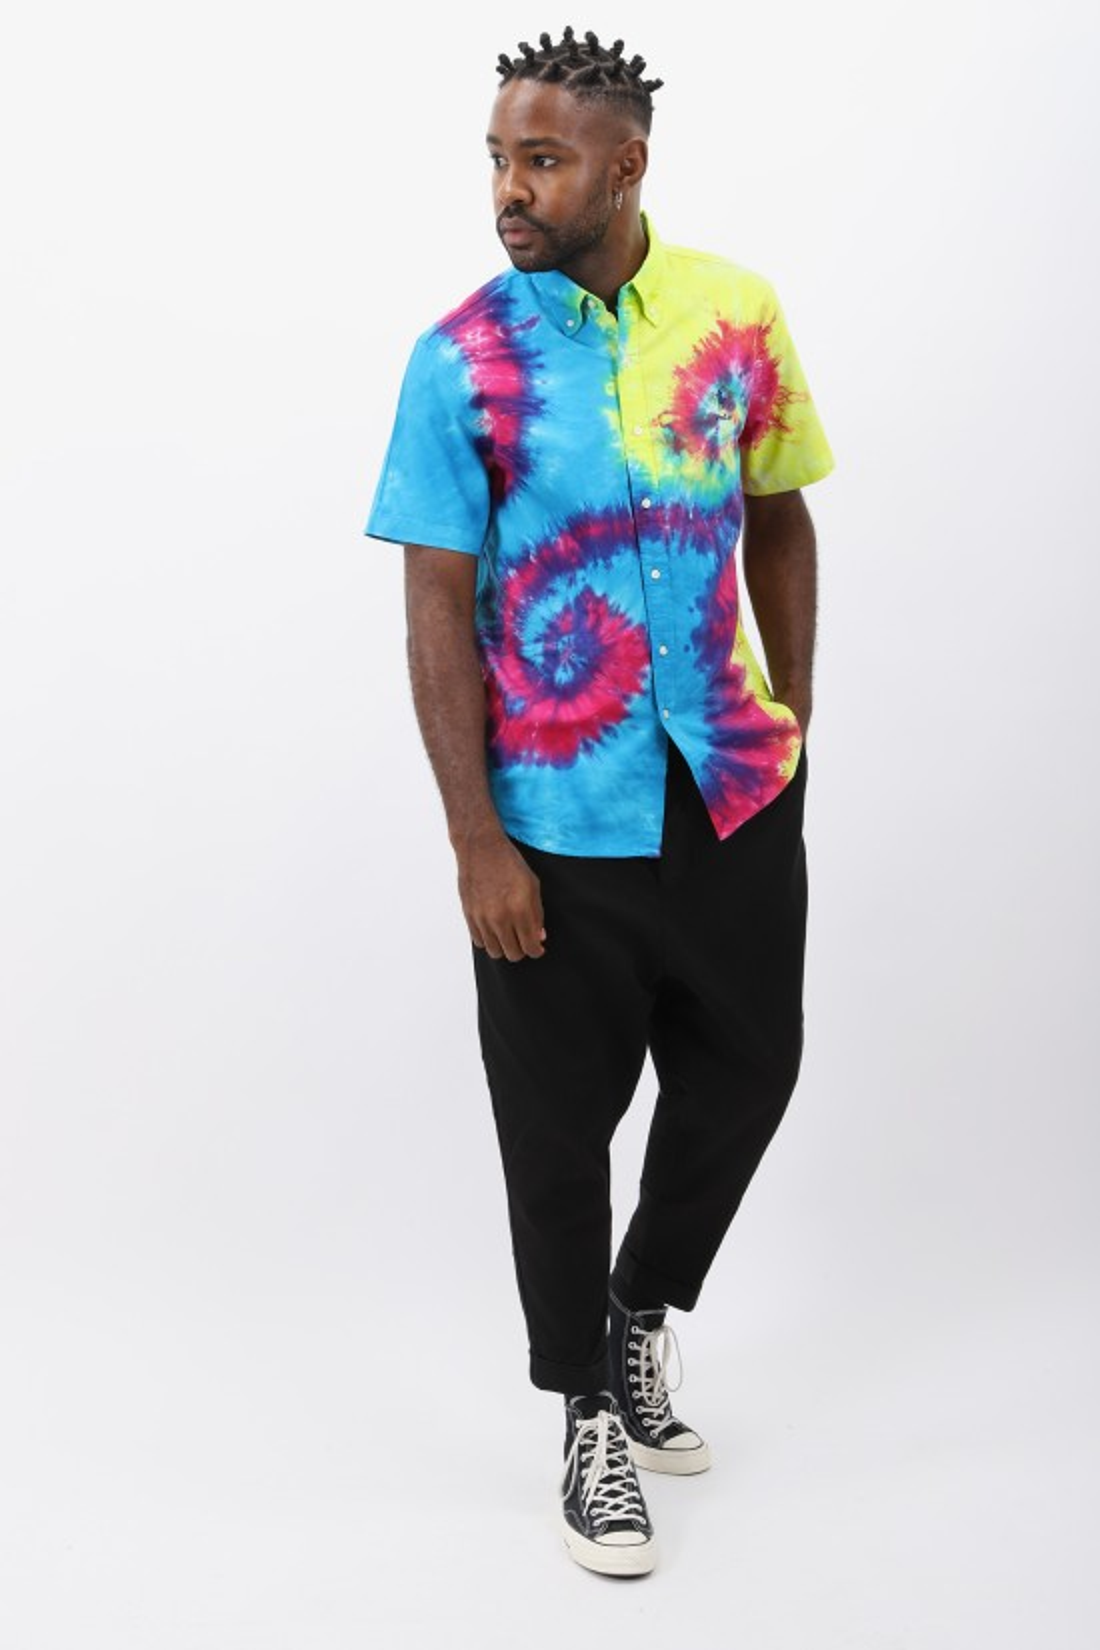 POLO RALPH LAUREN / Custom fit shirt oxford Tie dye laguna